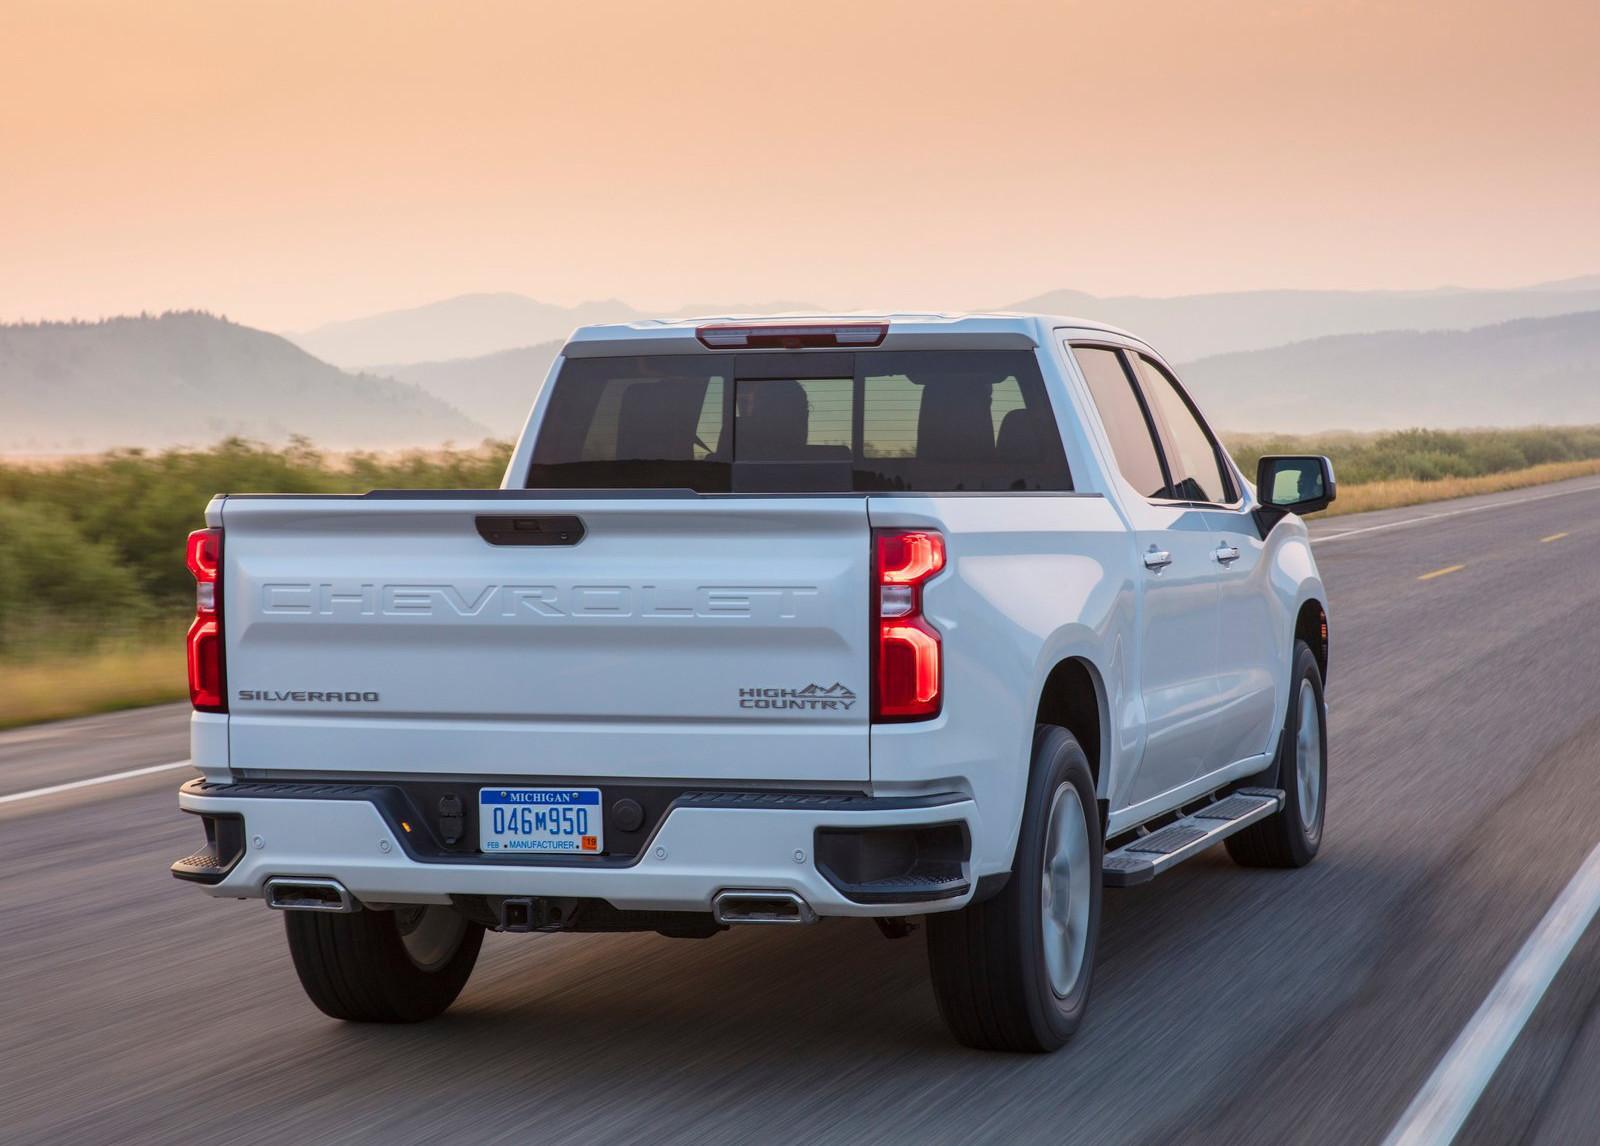 Foto de Chevrolet Cheyenne 2019 (12/14)